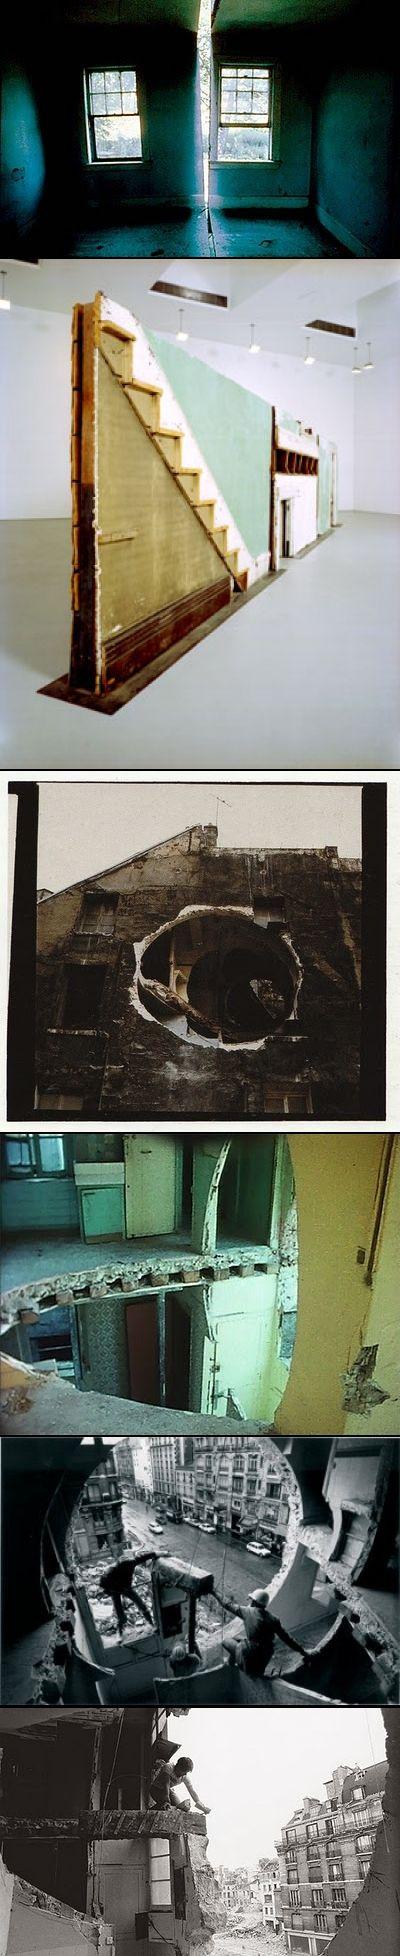 Gordon Matta Clark Building Cuts... Source: http://secretforts.blogspot.com/2011/01/anarchitect-gordon-matta-clark-1943.html